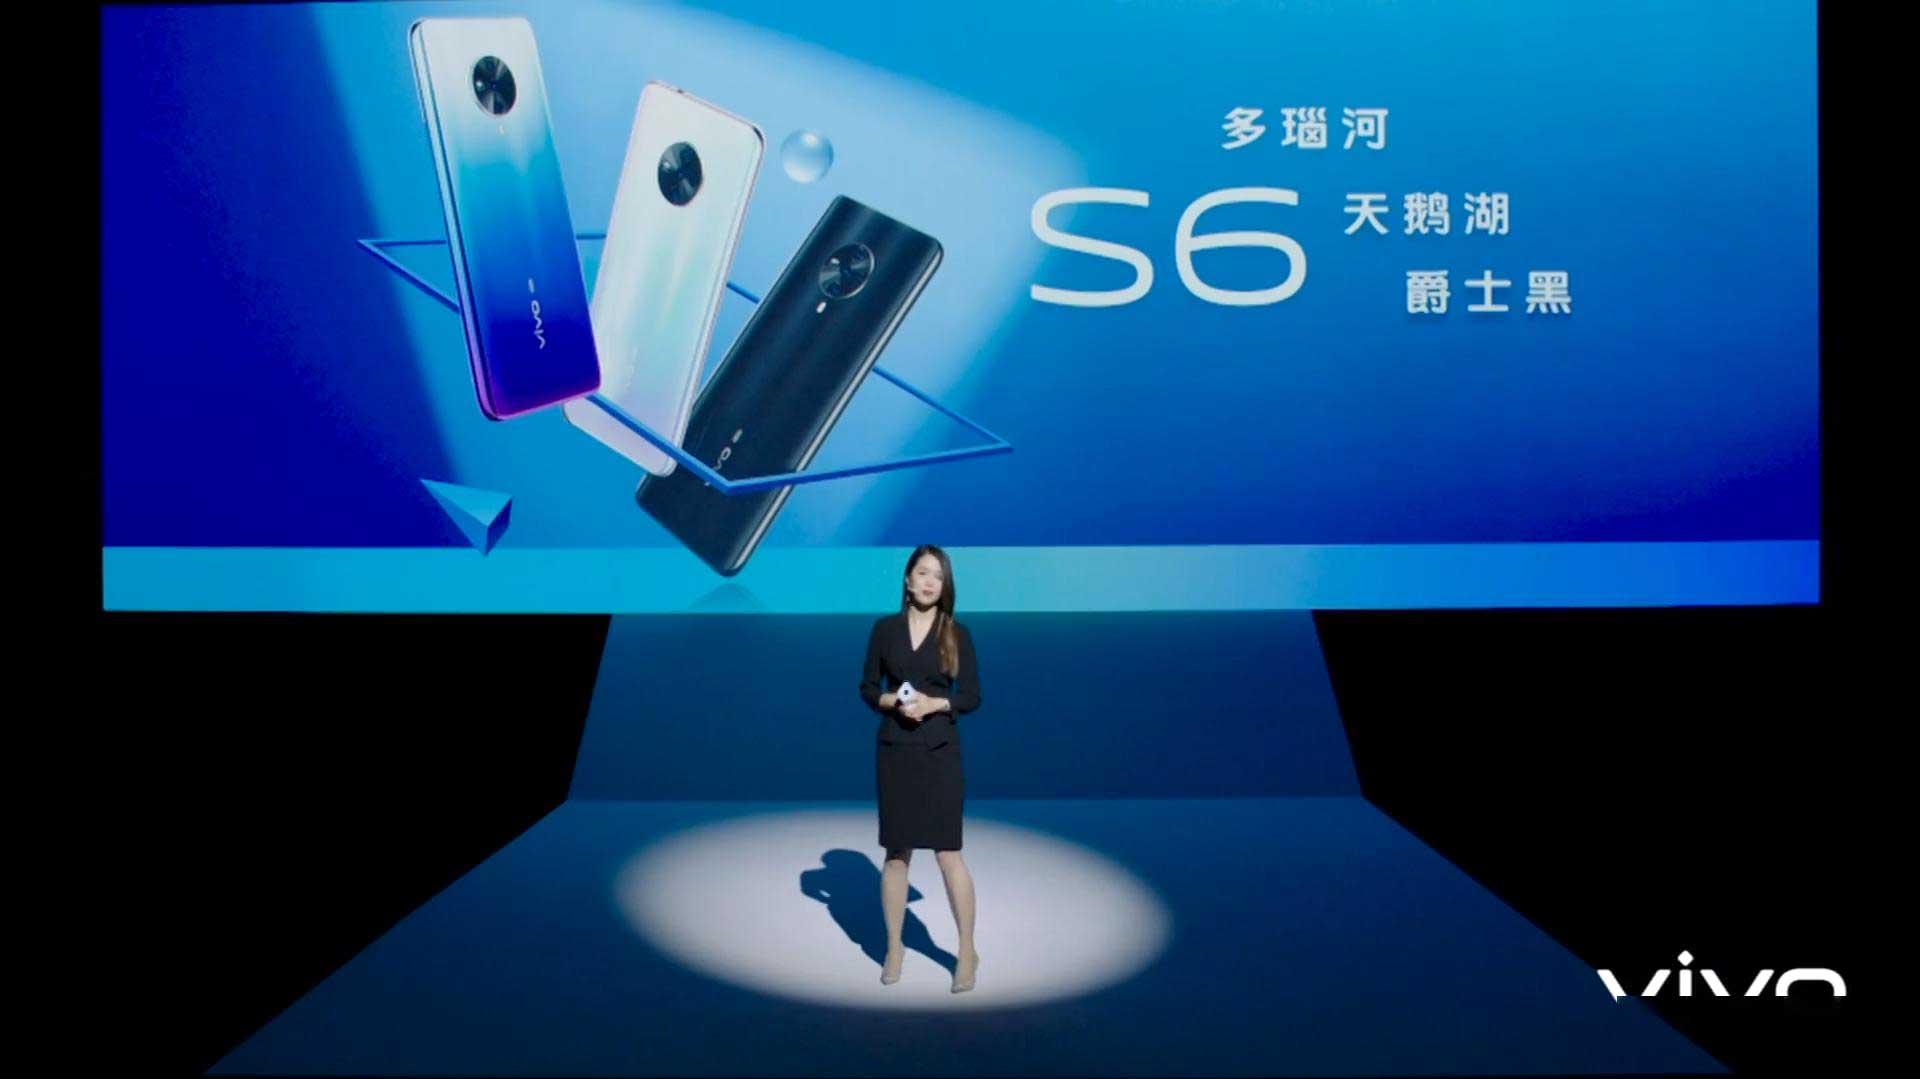 ویوو اس ۶ 5G